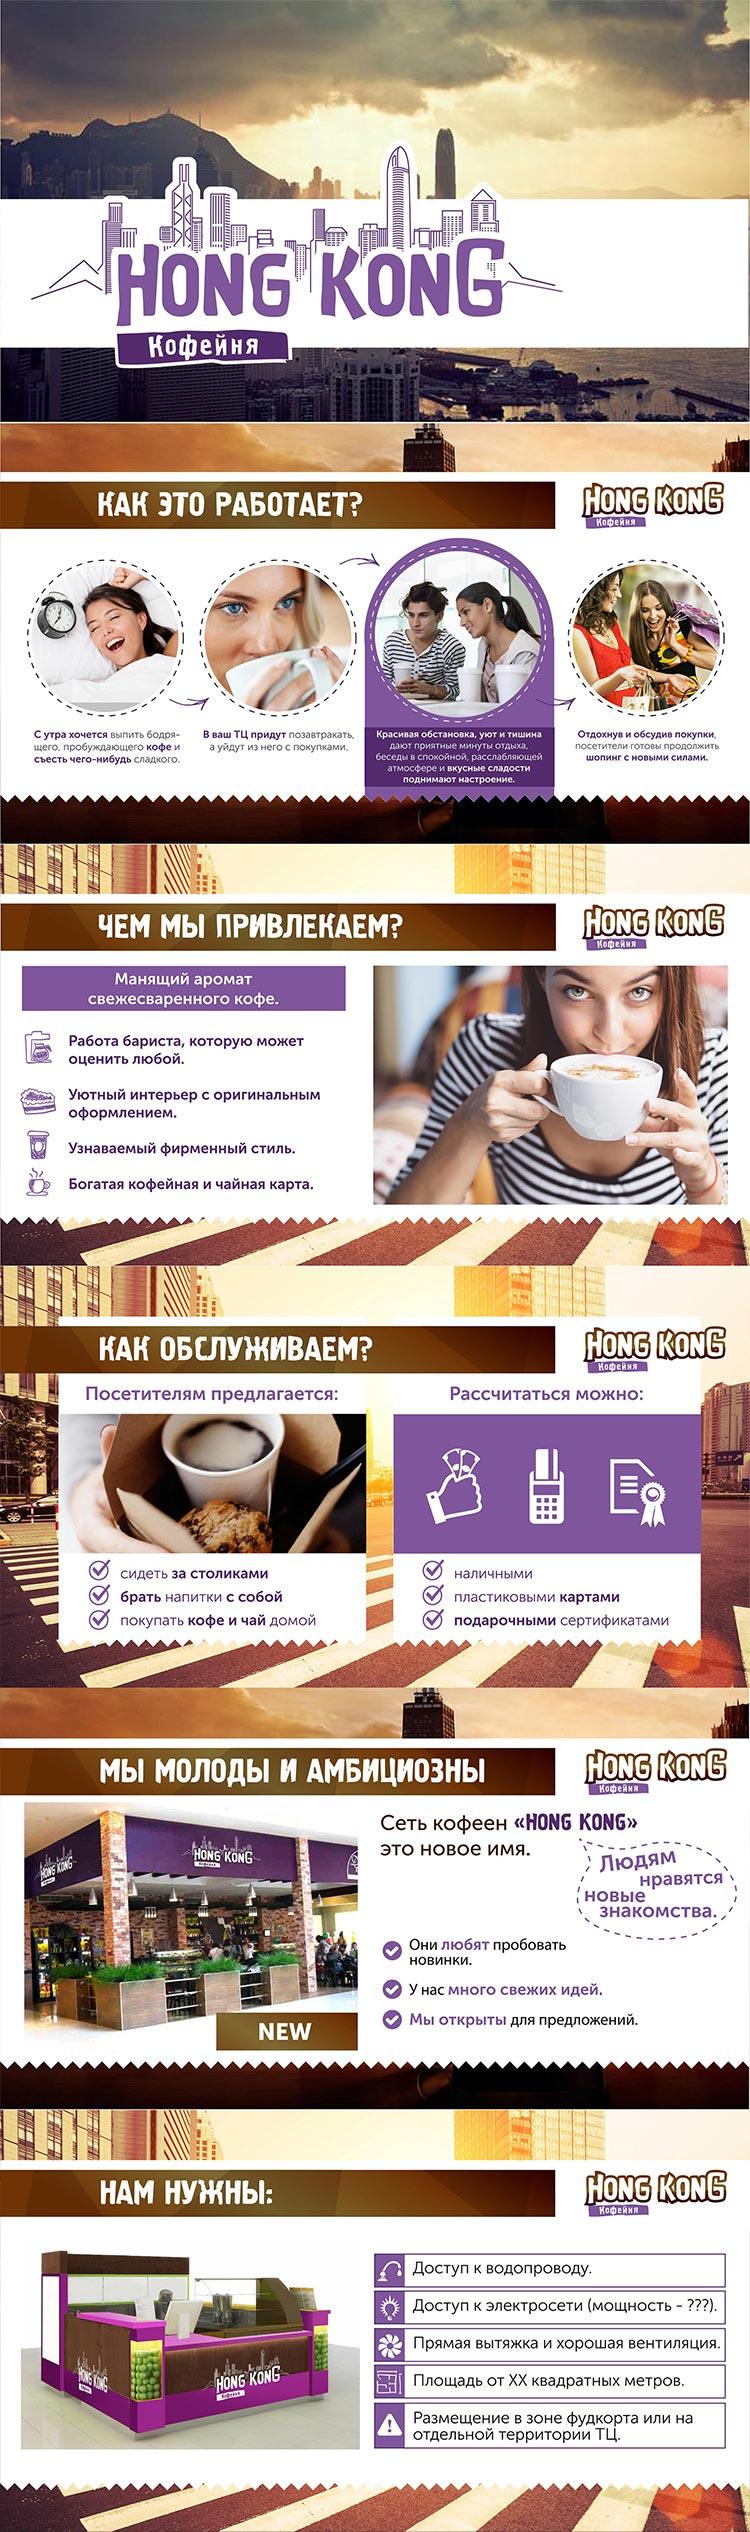 zakazat-Prezentacija-kofejni-dlja-arendy-mesta-v-torgovom-centre